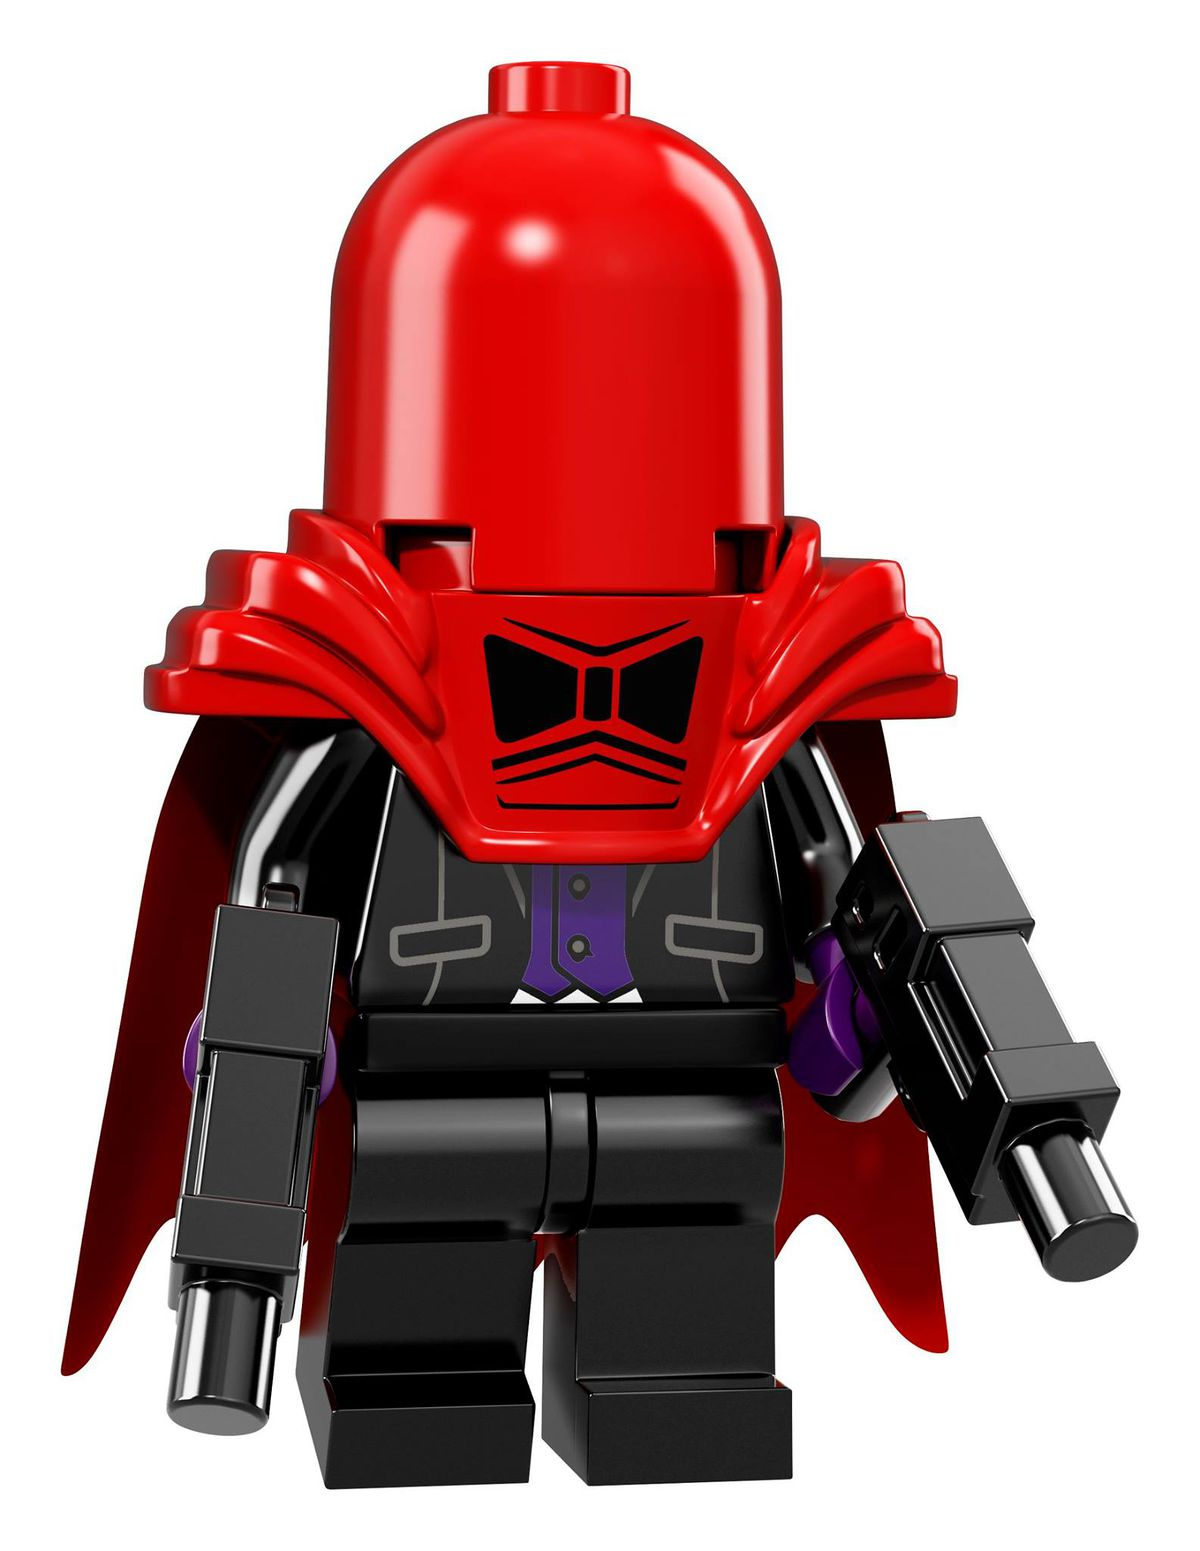 Red Hood The Lego Batman Movie Brickipedia The Lego Wiki